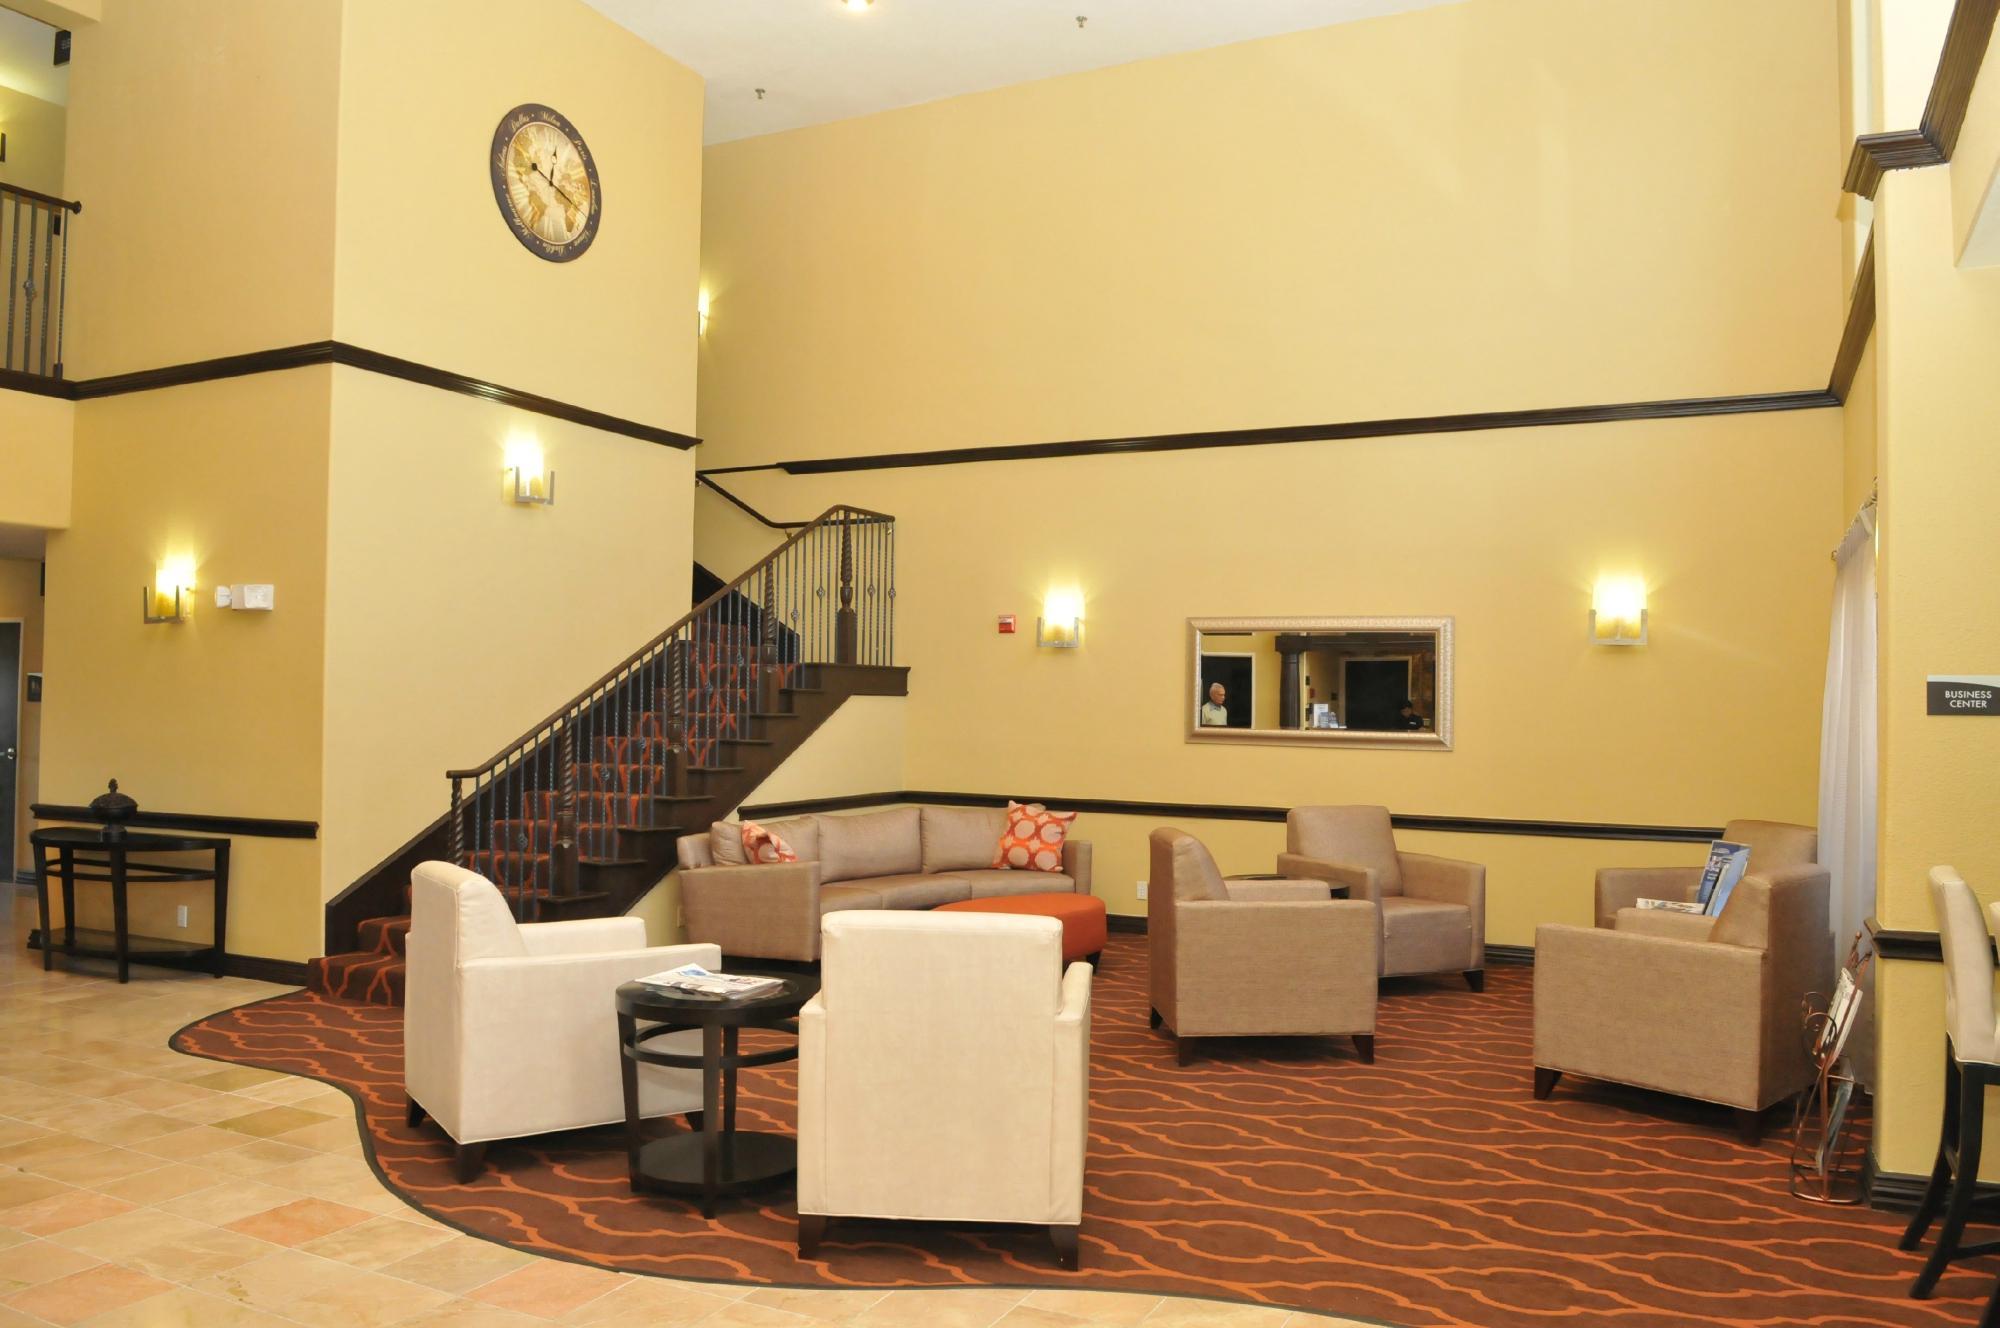 BEST WESTERN PLUS DFW Airport Suites